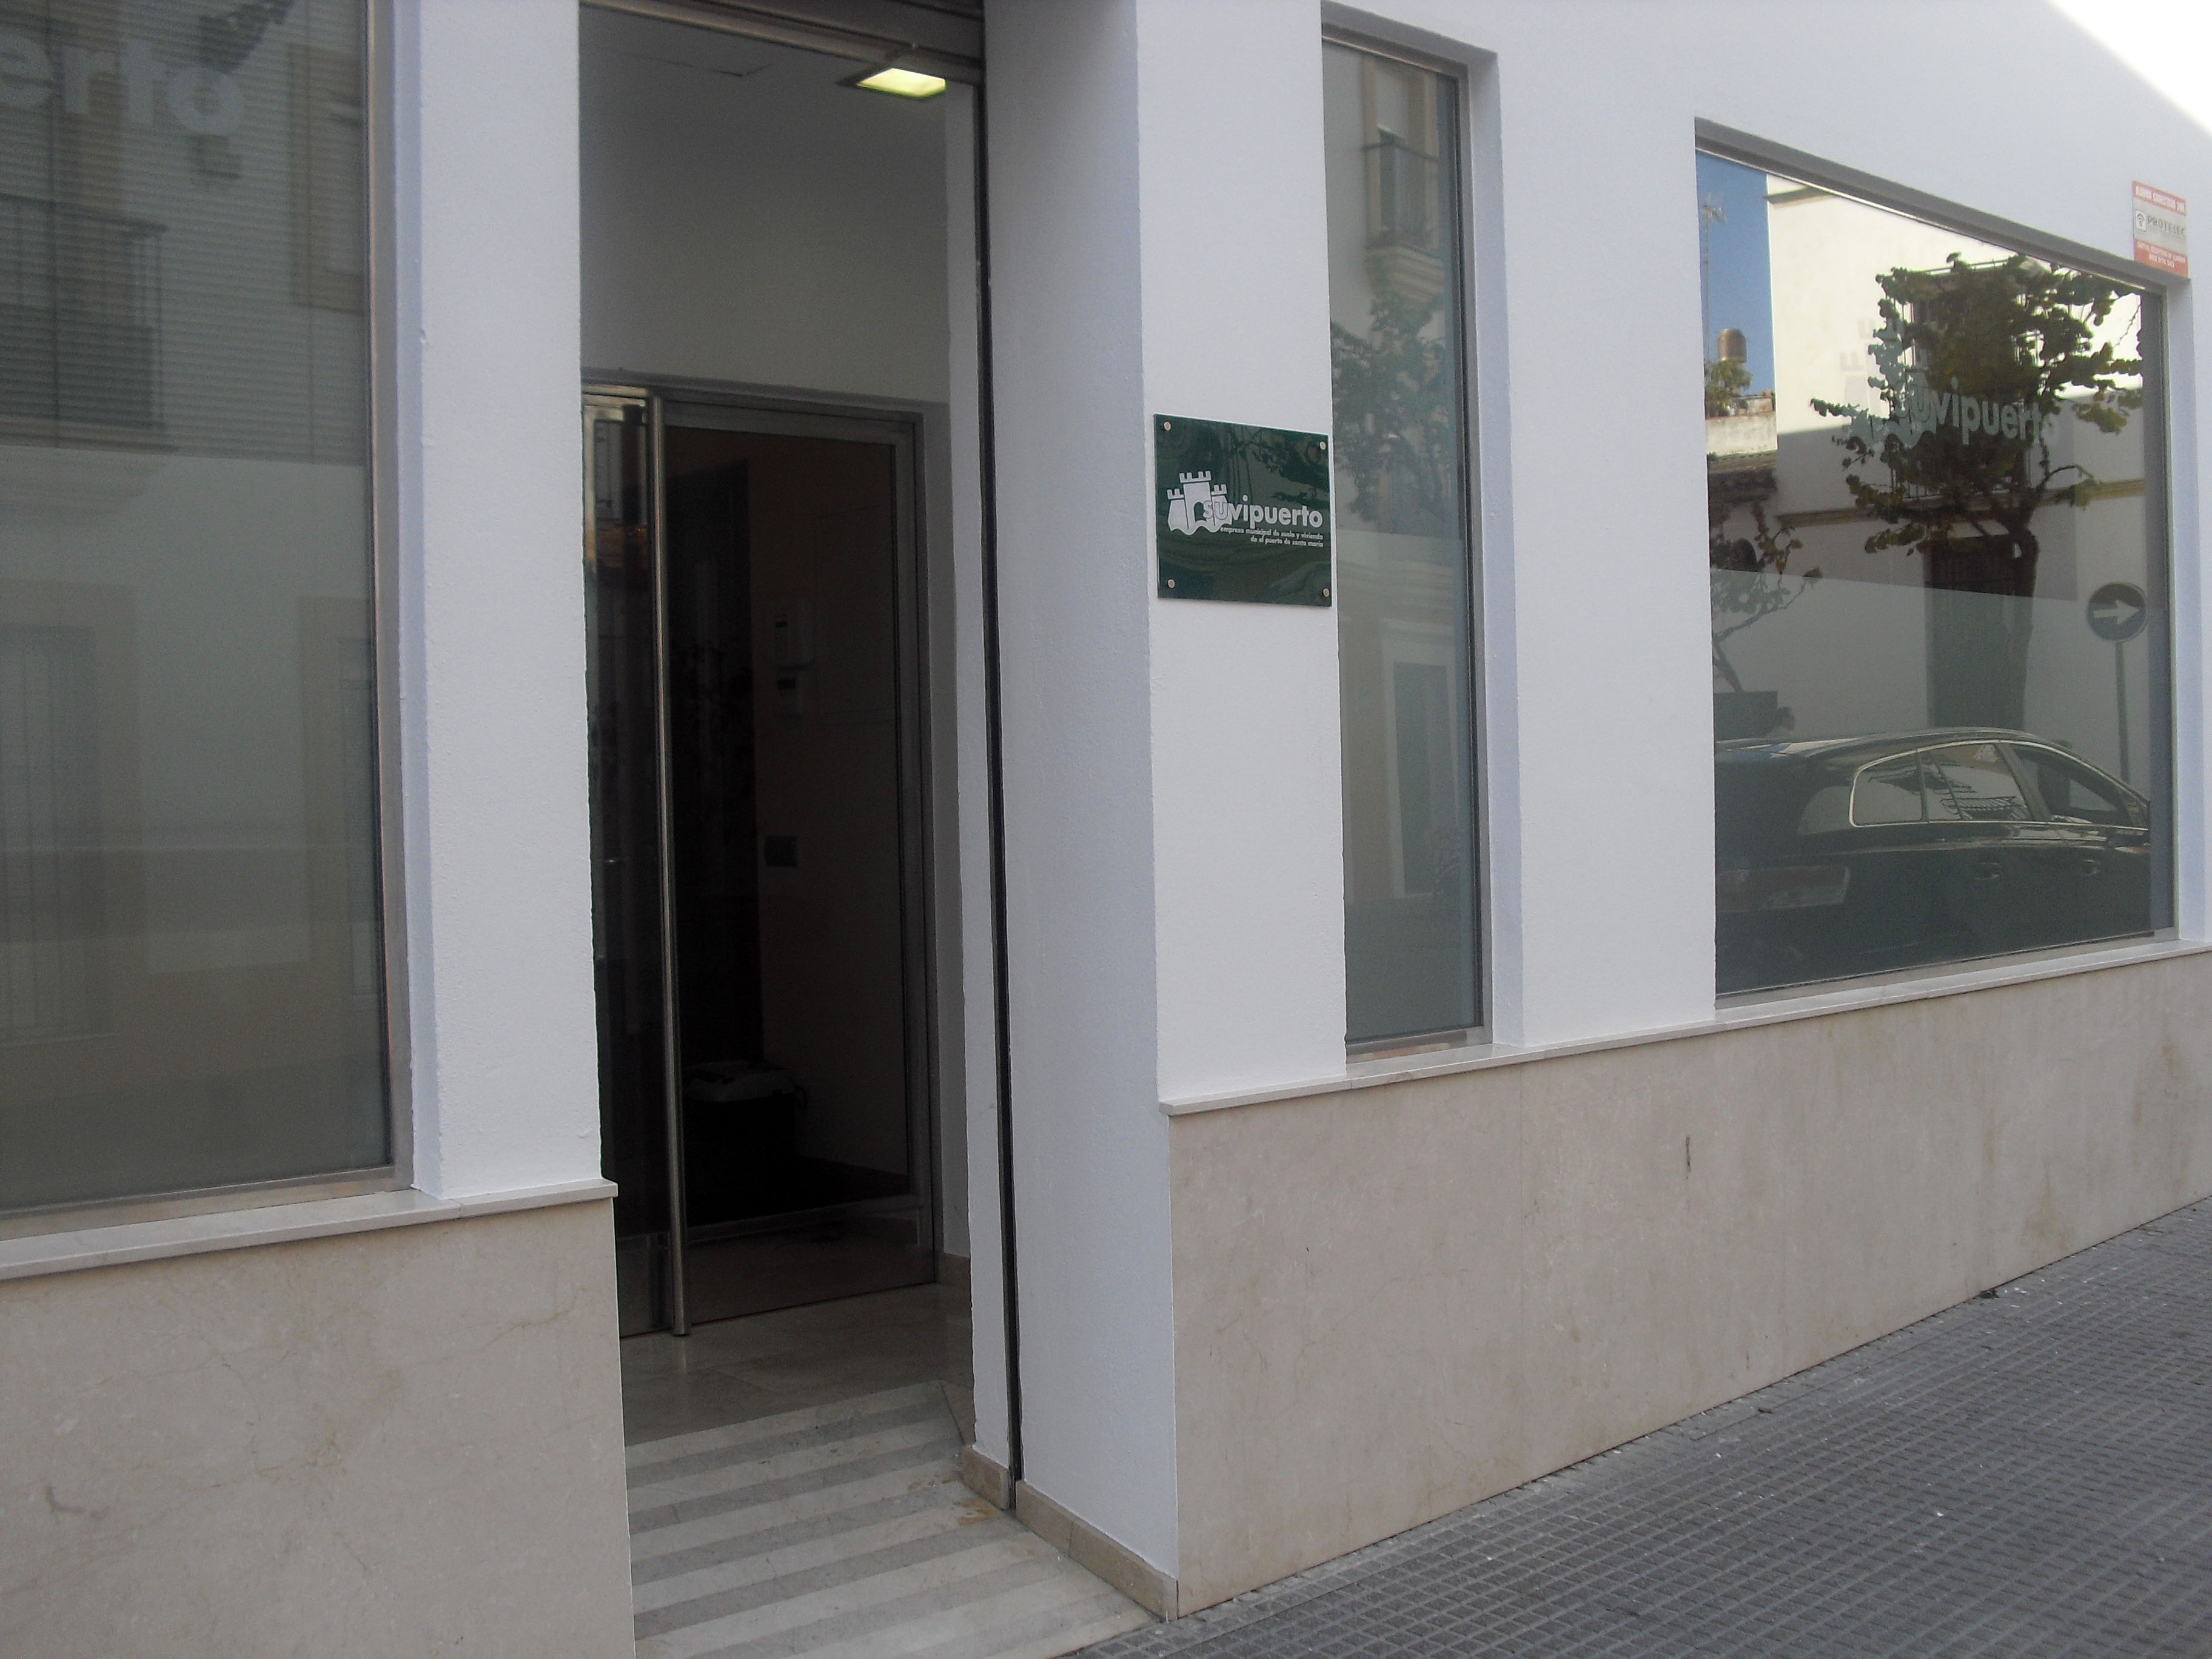 Elpuerto de santa mar a for Oficina virtual junta de andalucia educacion